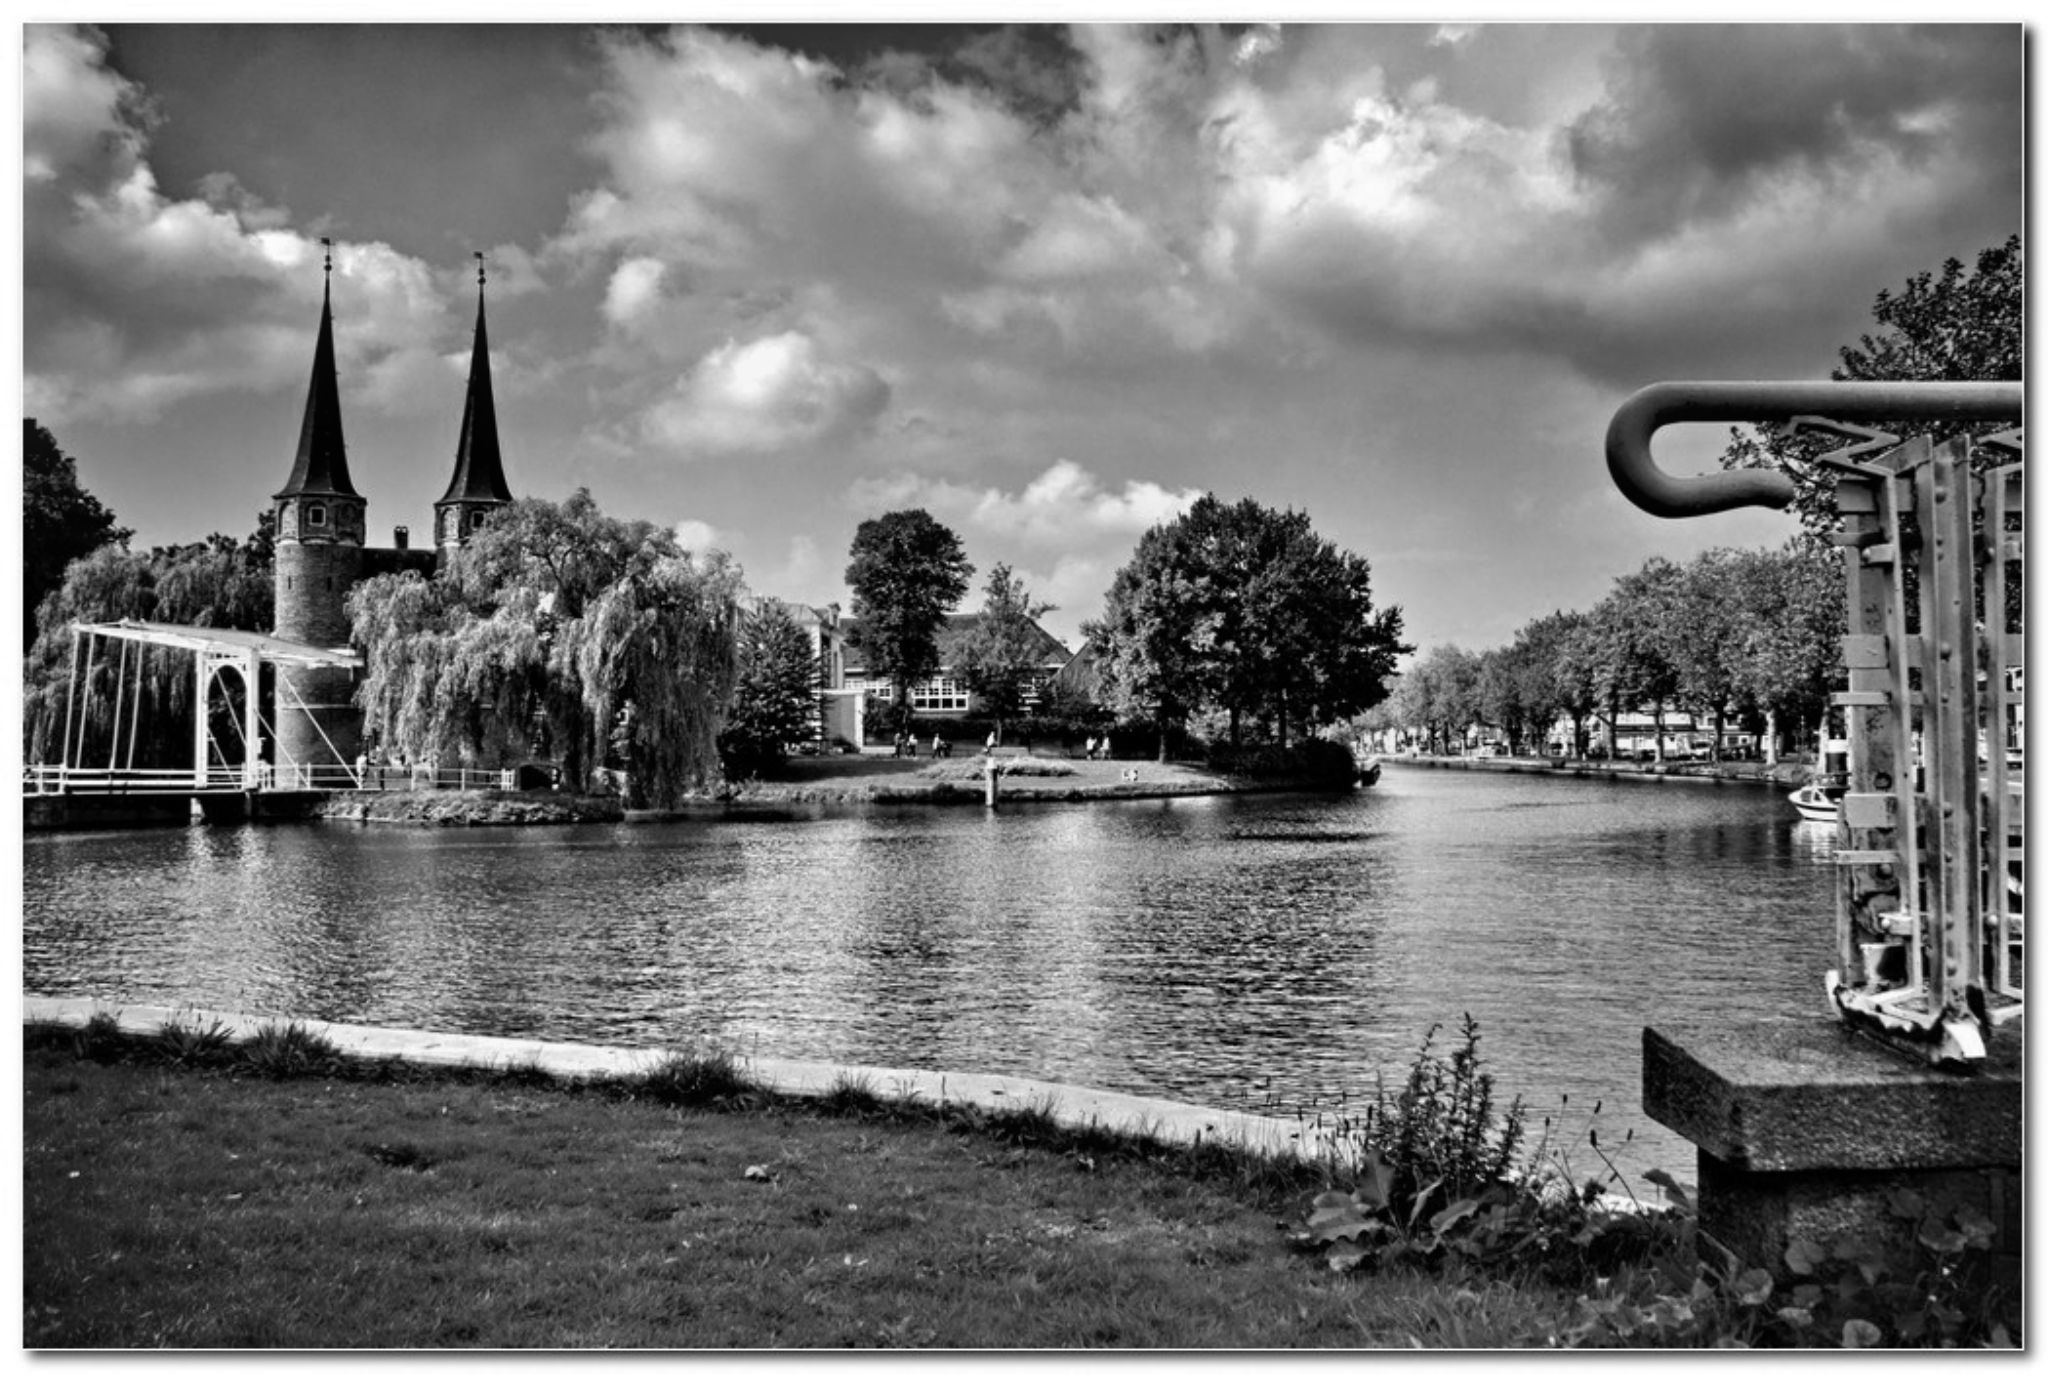 Long time ago by Watze D. de Haan